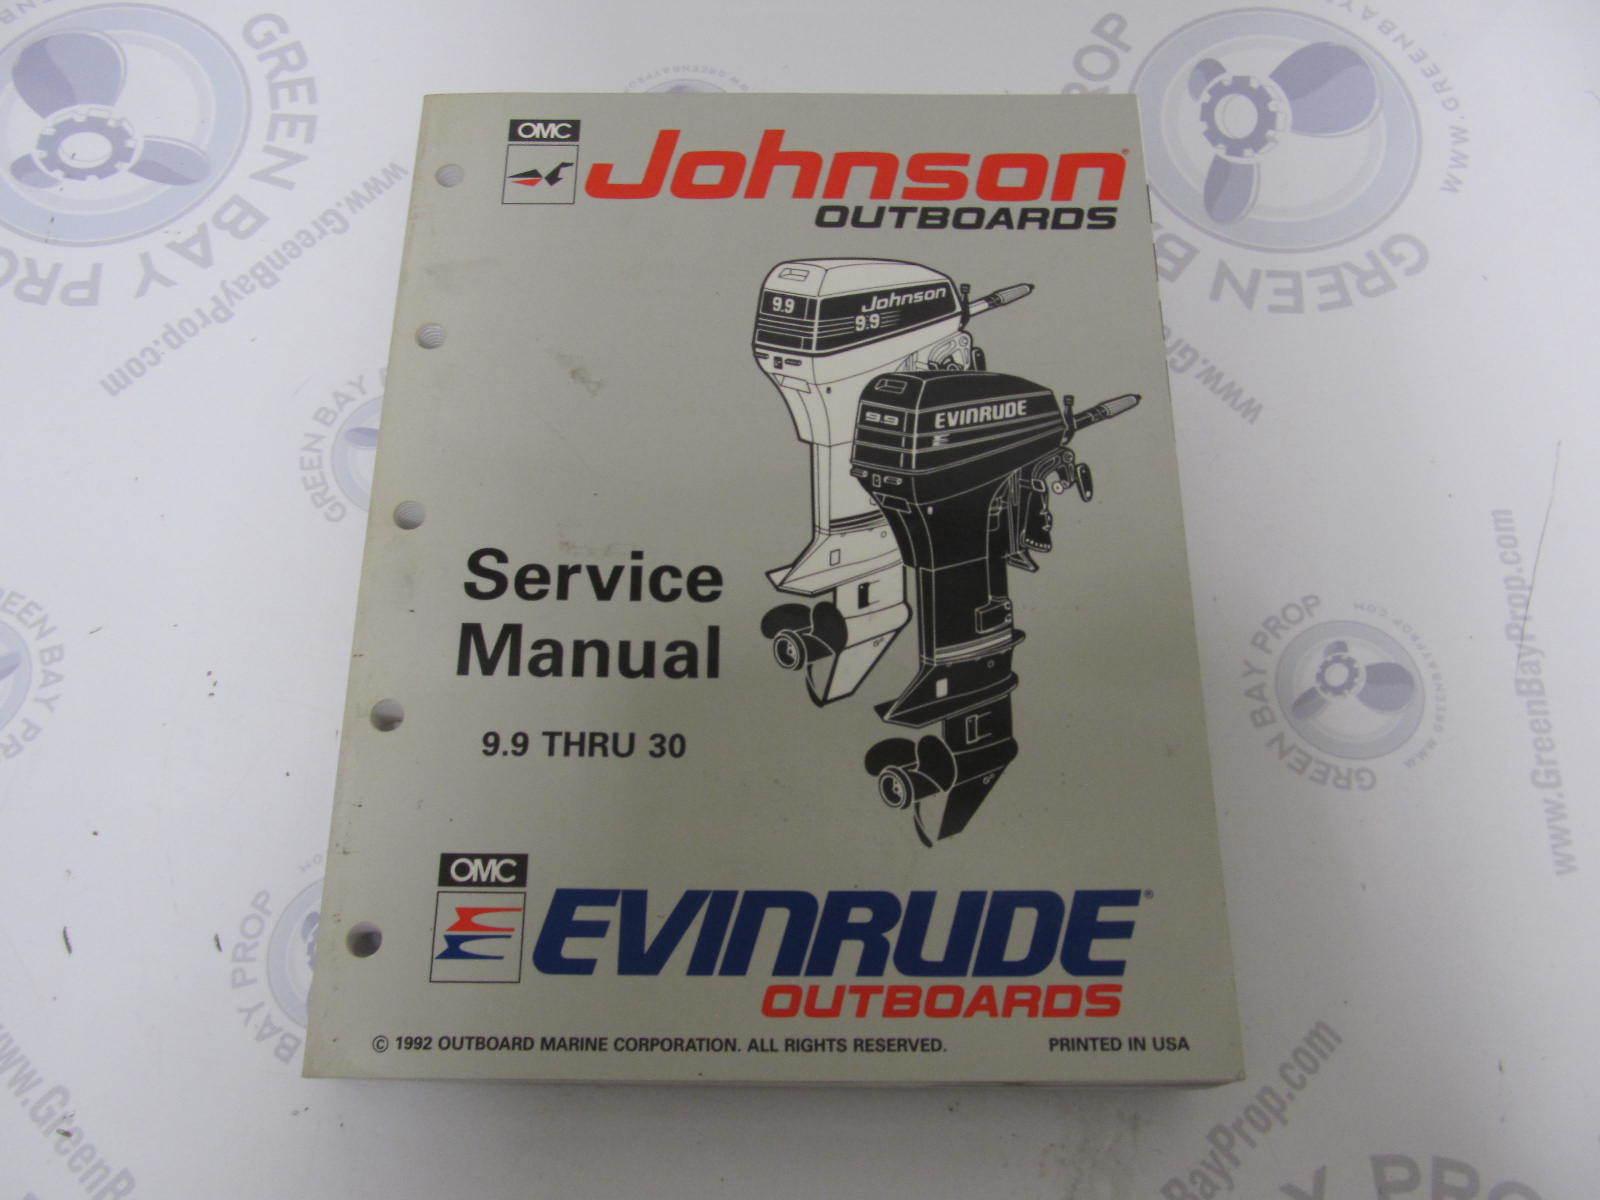 "... 9.9-30 HP 1993. 508282 Johnson Evinrude Outboard Service Manual ""ET"" ..."